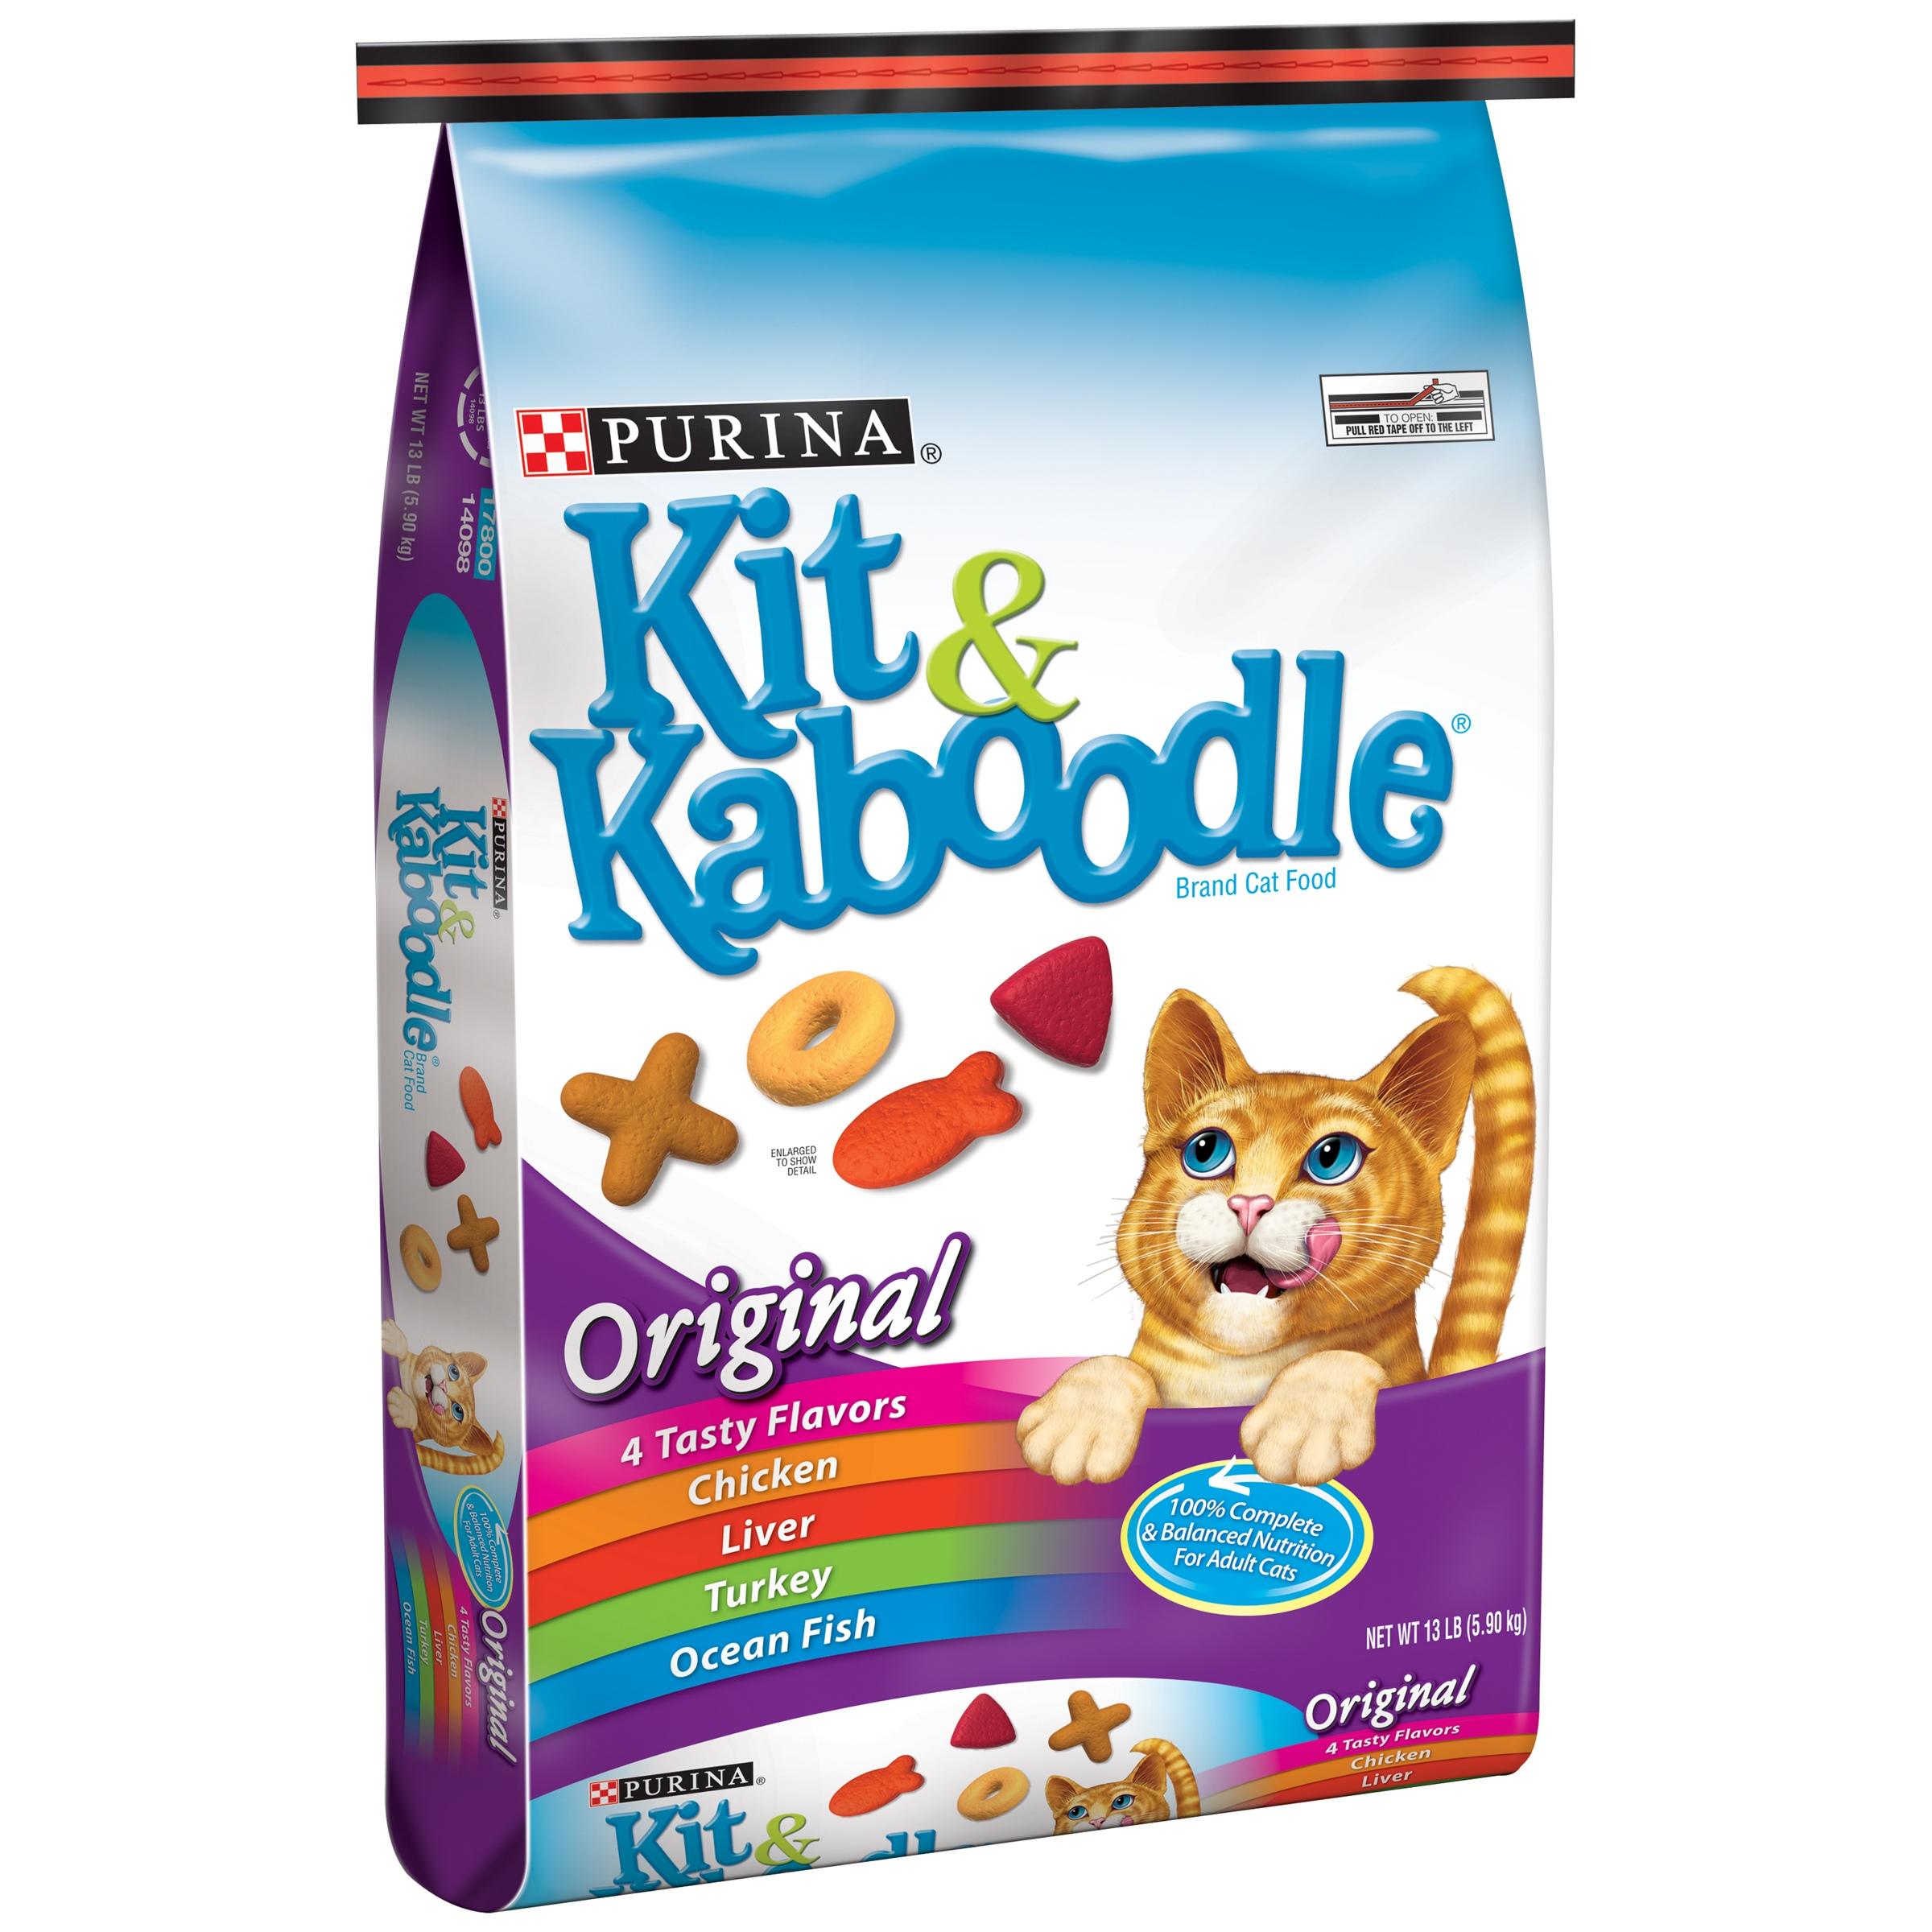 Purina Kit & Kaboodle Original Dry Cat Food, 13 Lb - Walmart.com